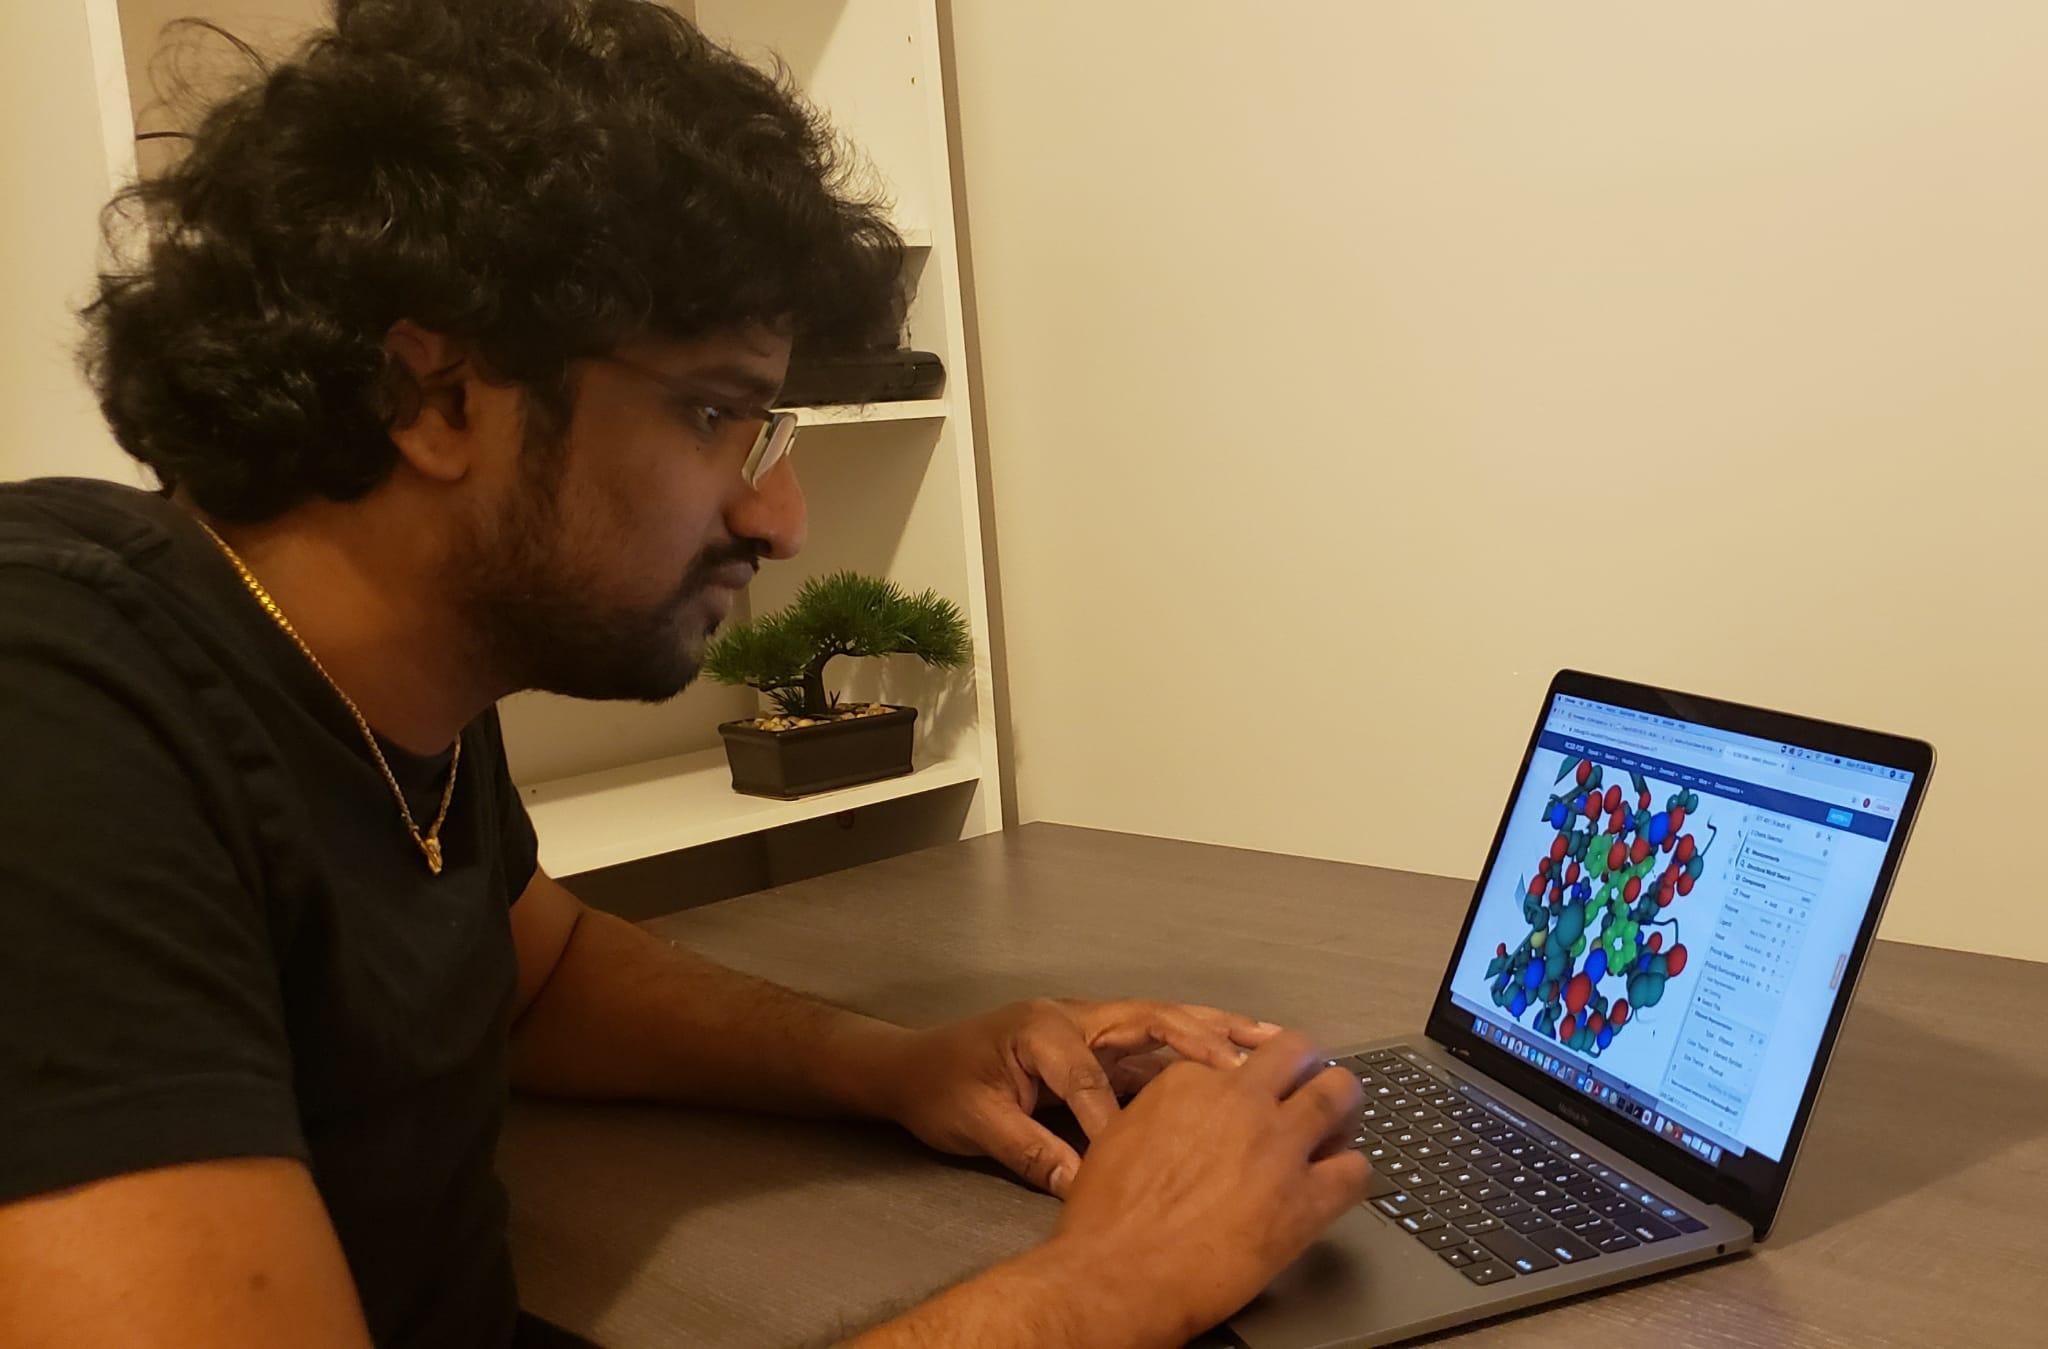 Aravindhan Ganesan working at a computer.